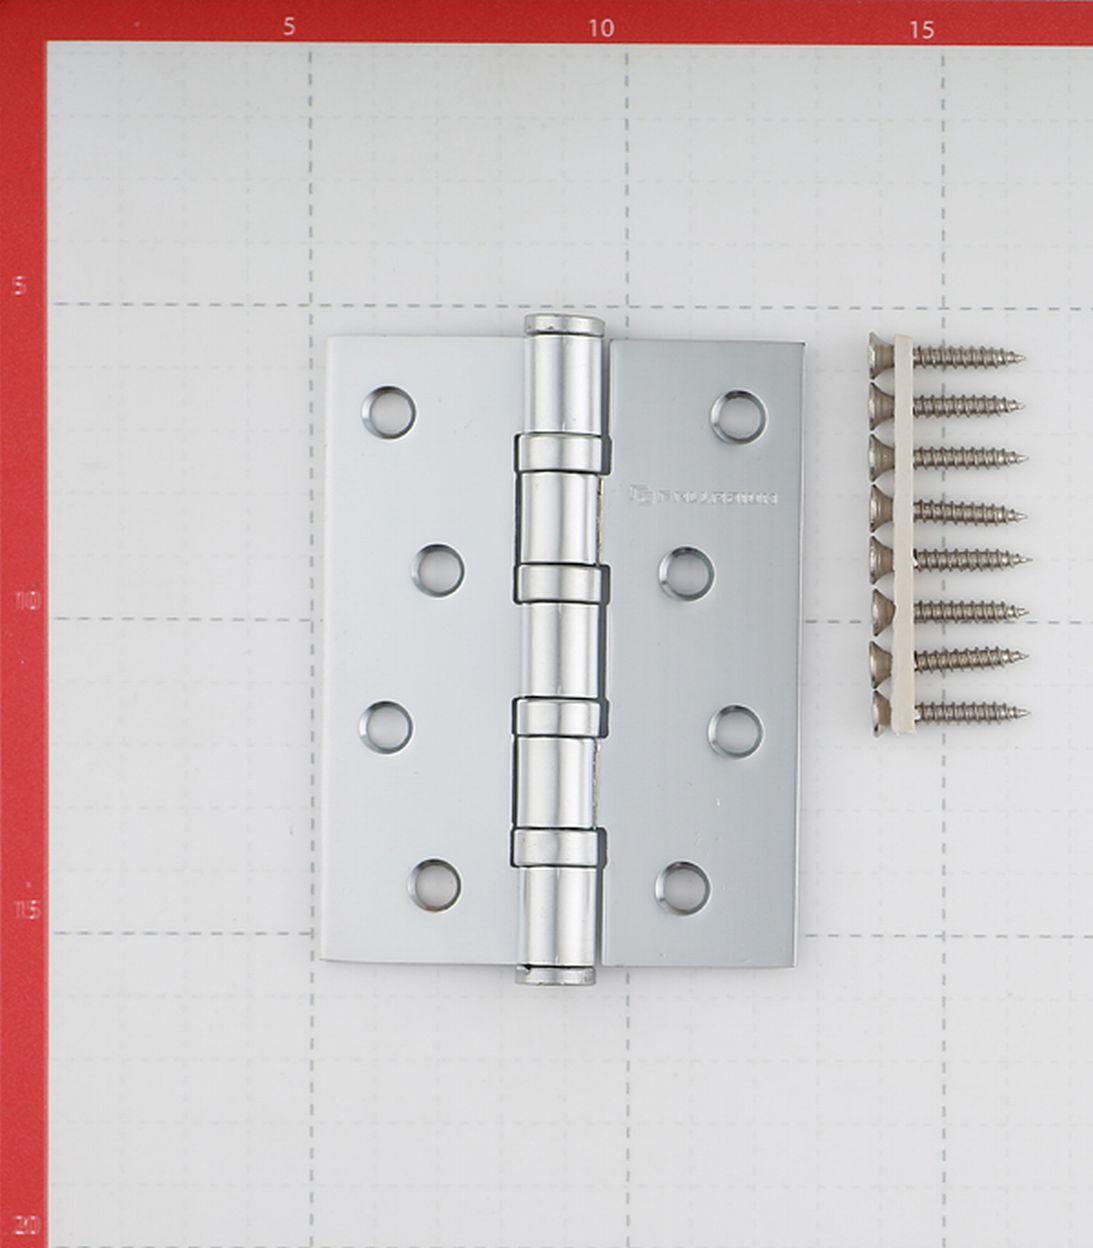 Петля Palladium N 4BB-100 PC универсальная неразъемная 100х75 мм серебро